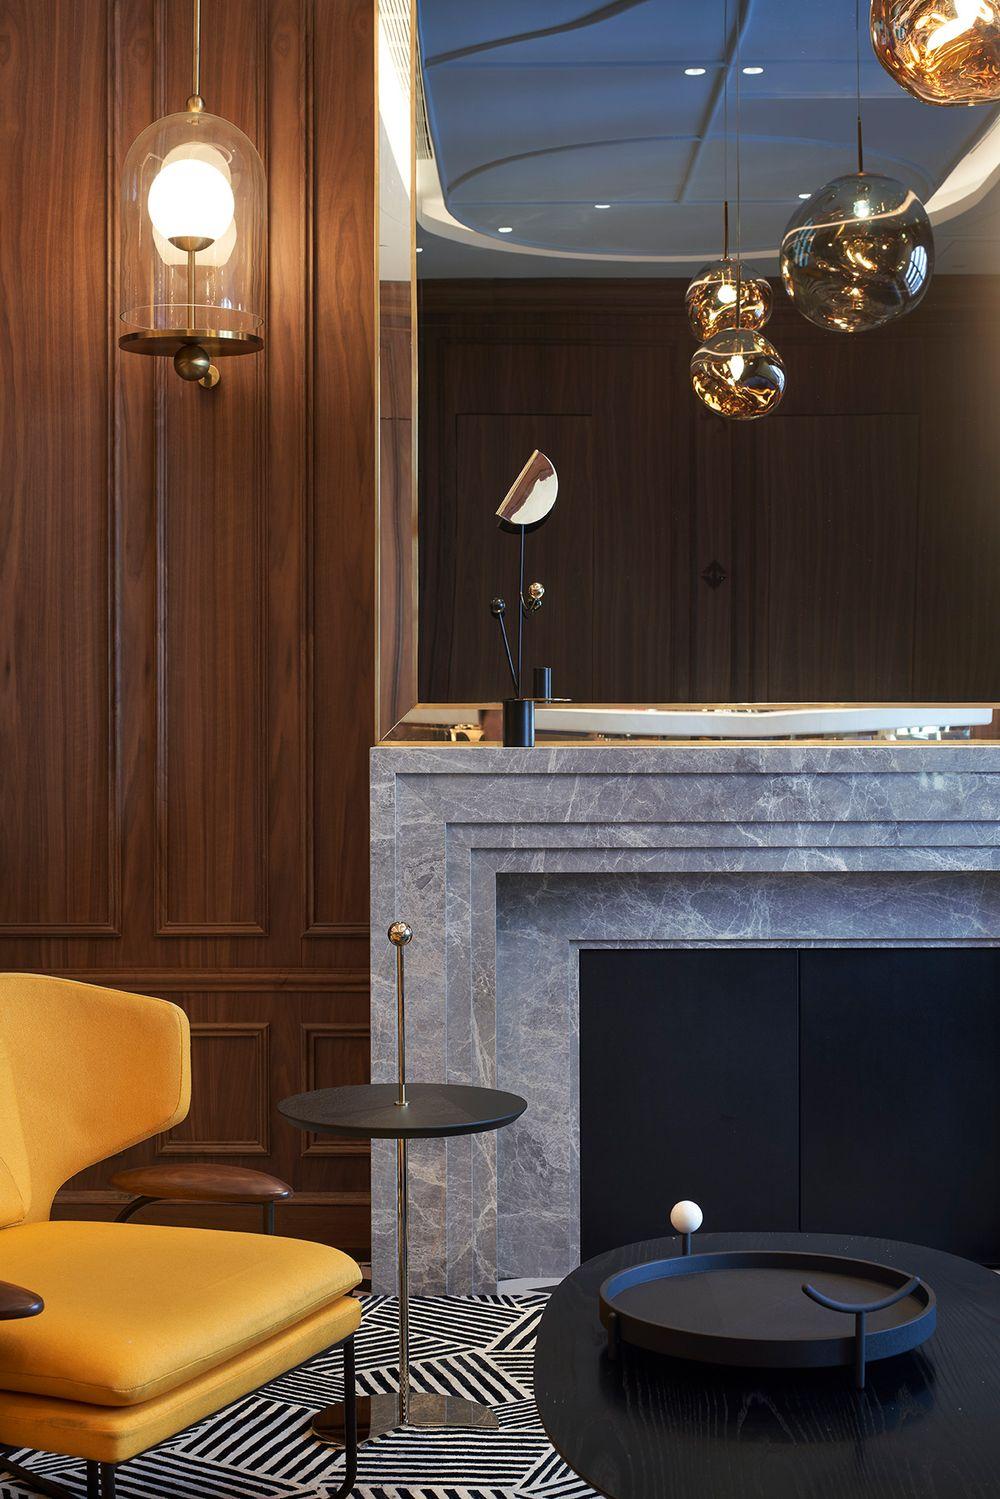 Lady Bund restaurant and lounge